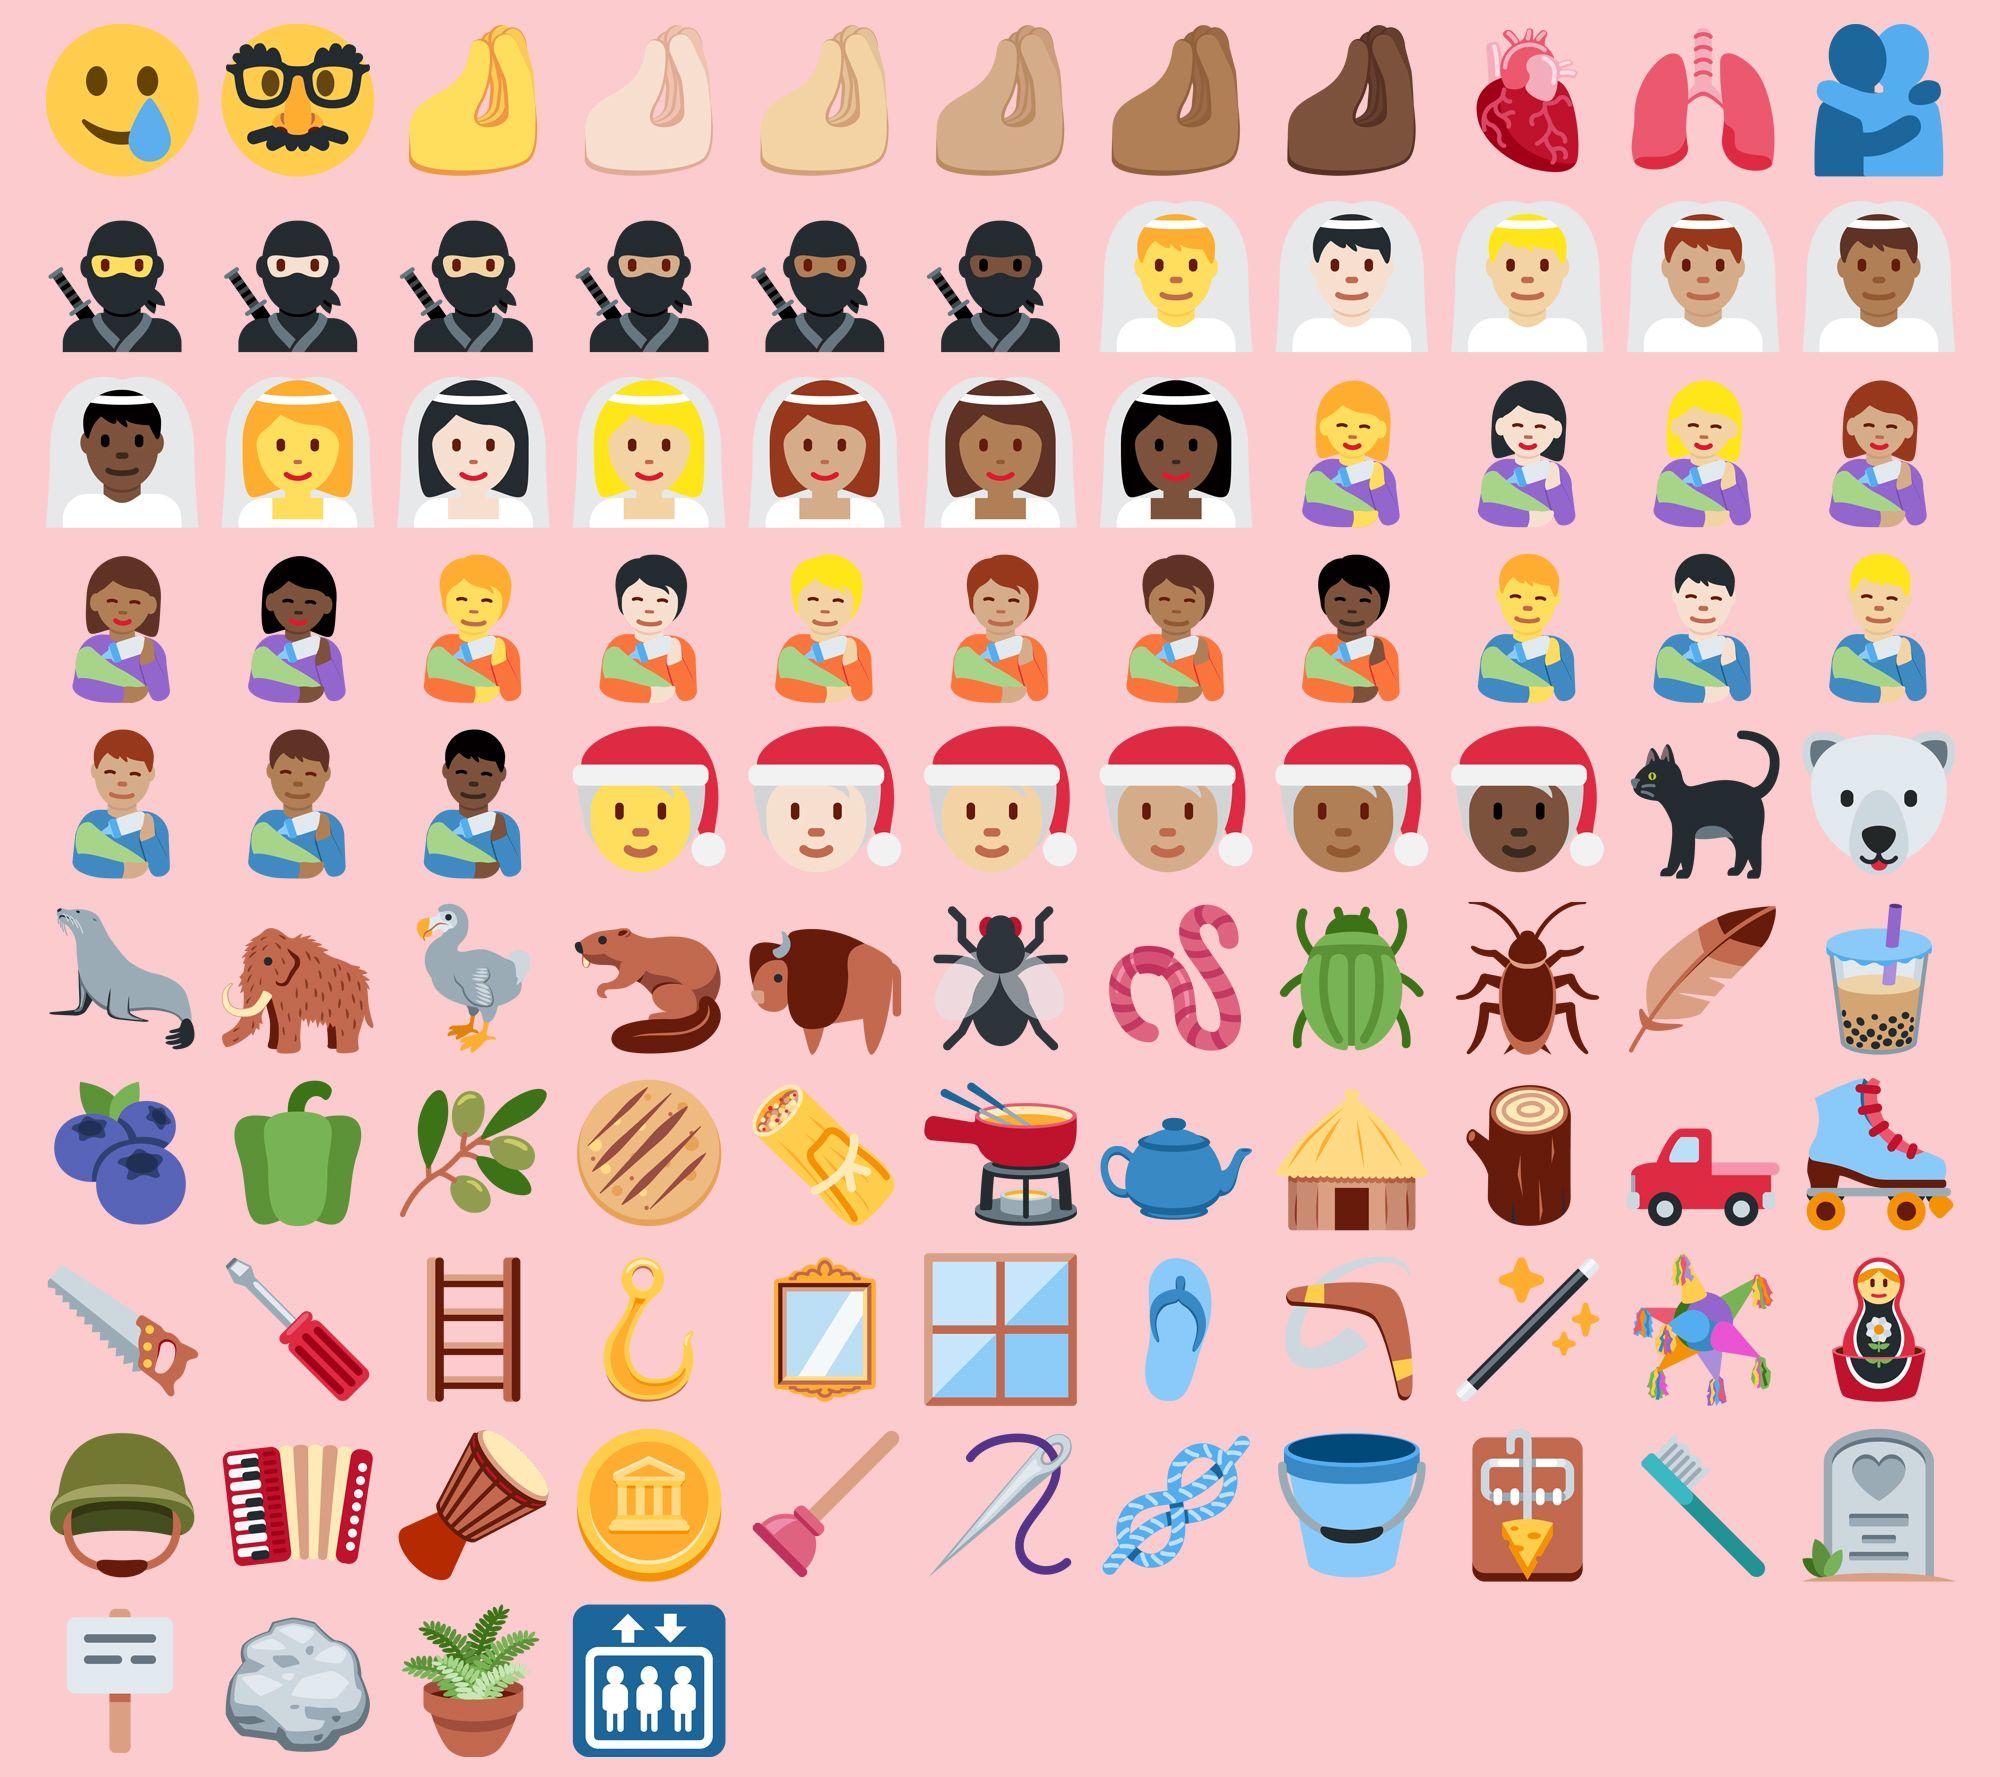 Twemoji 13.0 Emoji Changelog